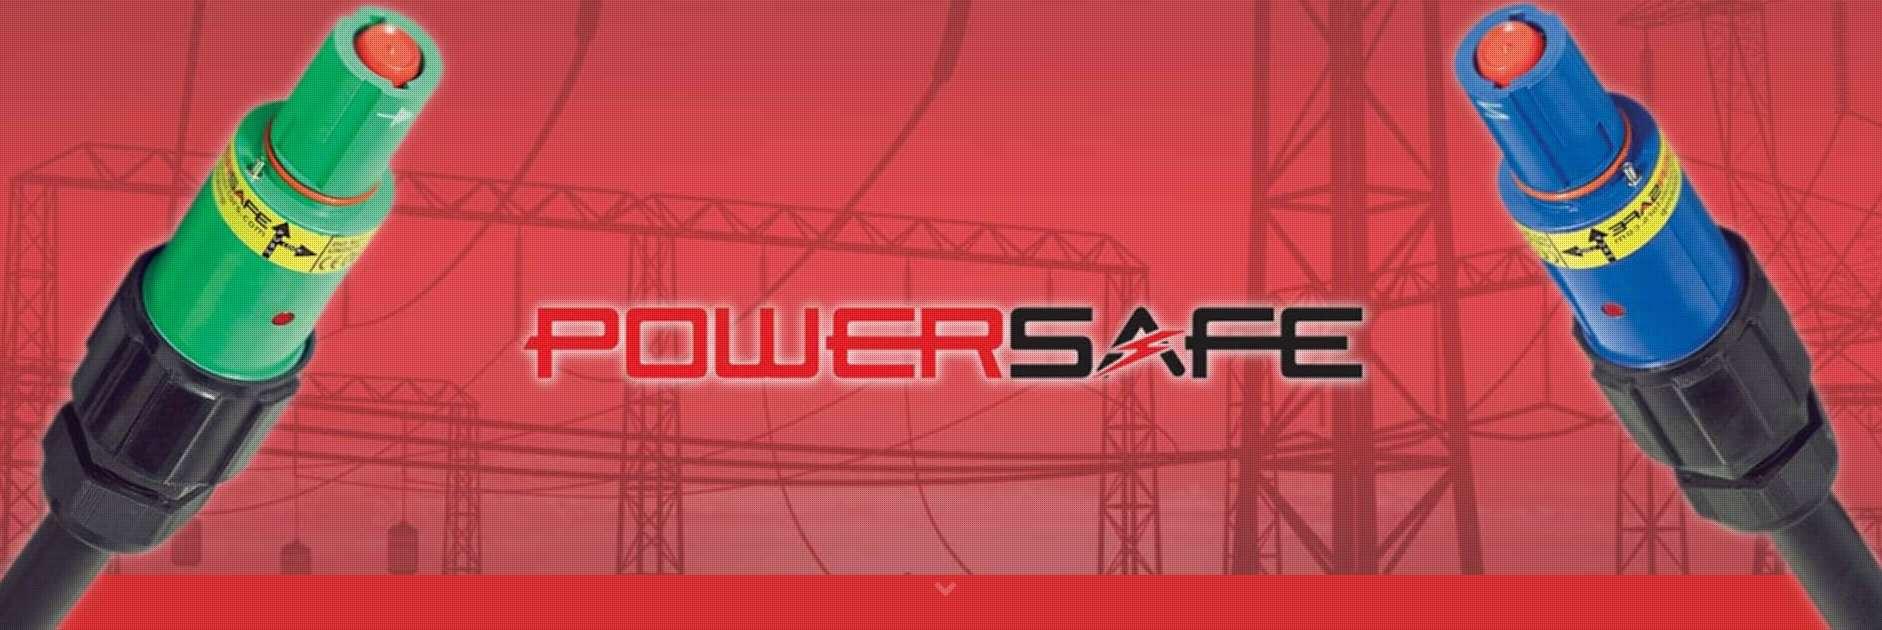 Powersafe - Single Pole Power Connectors